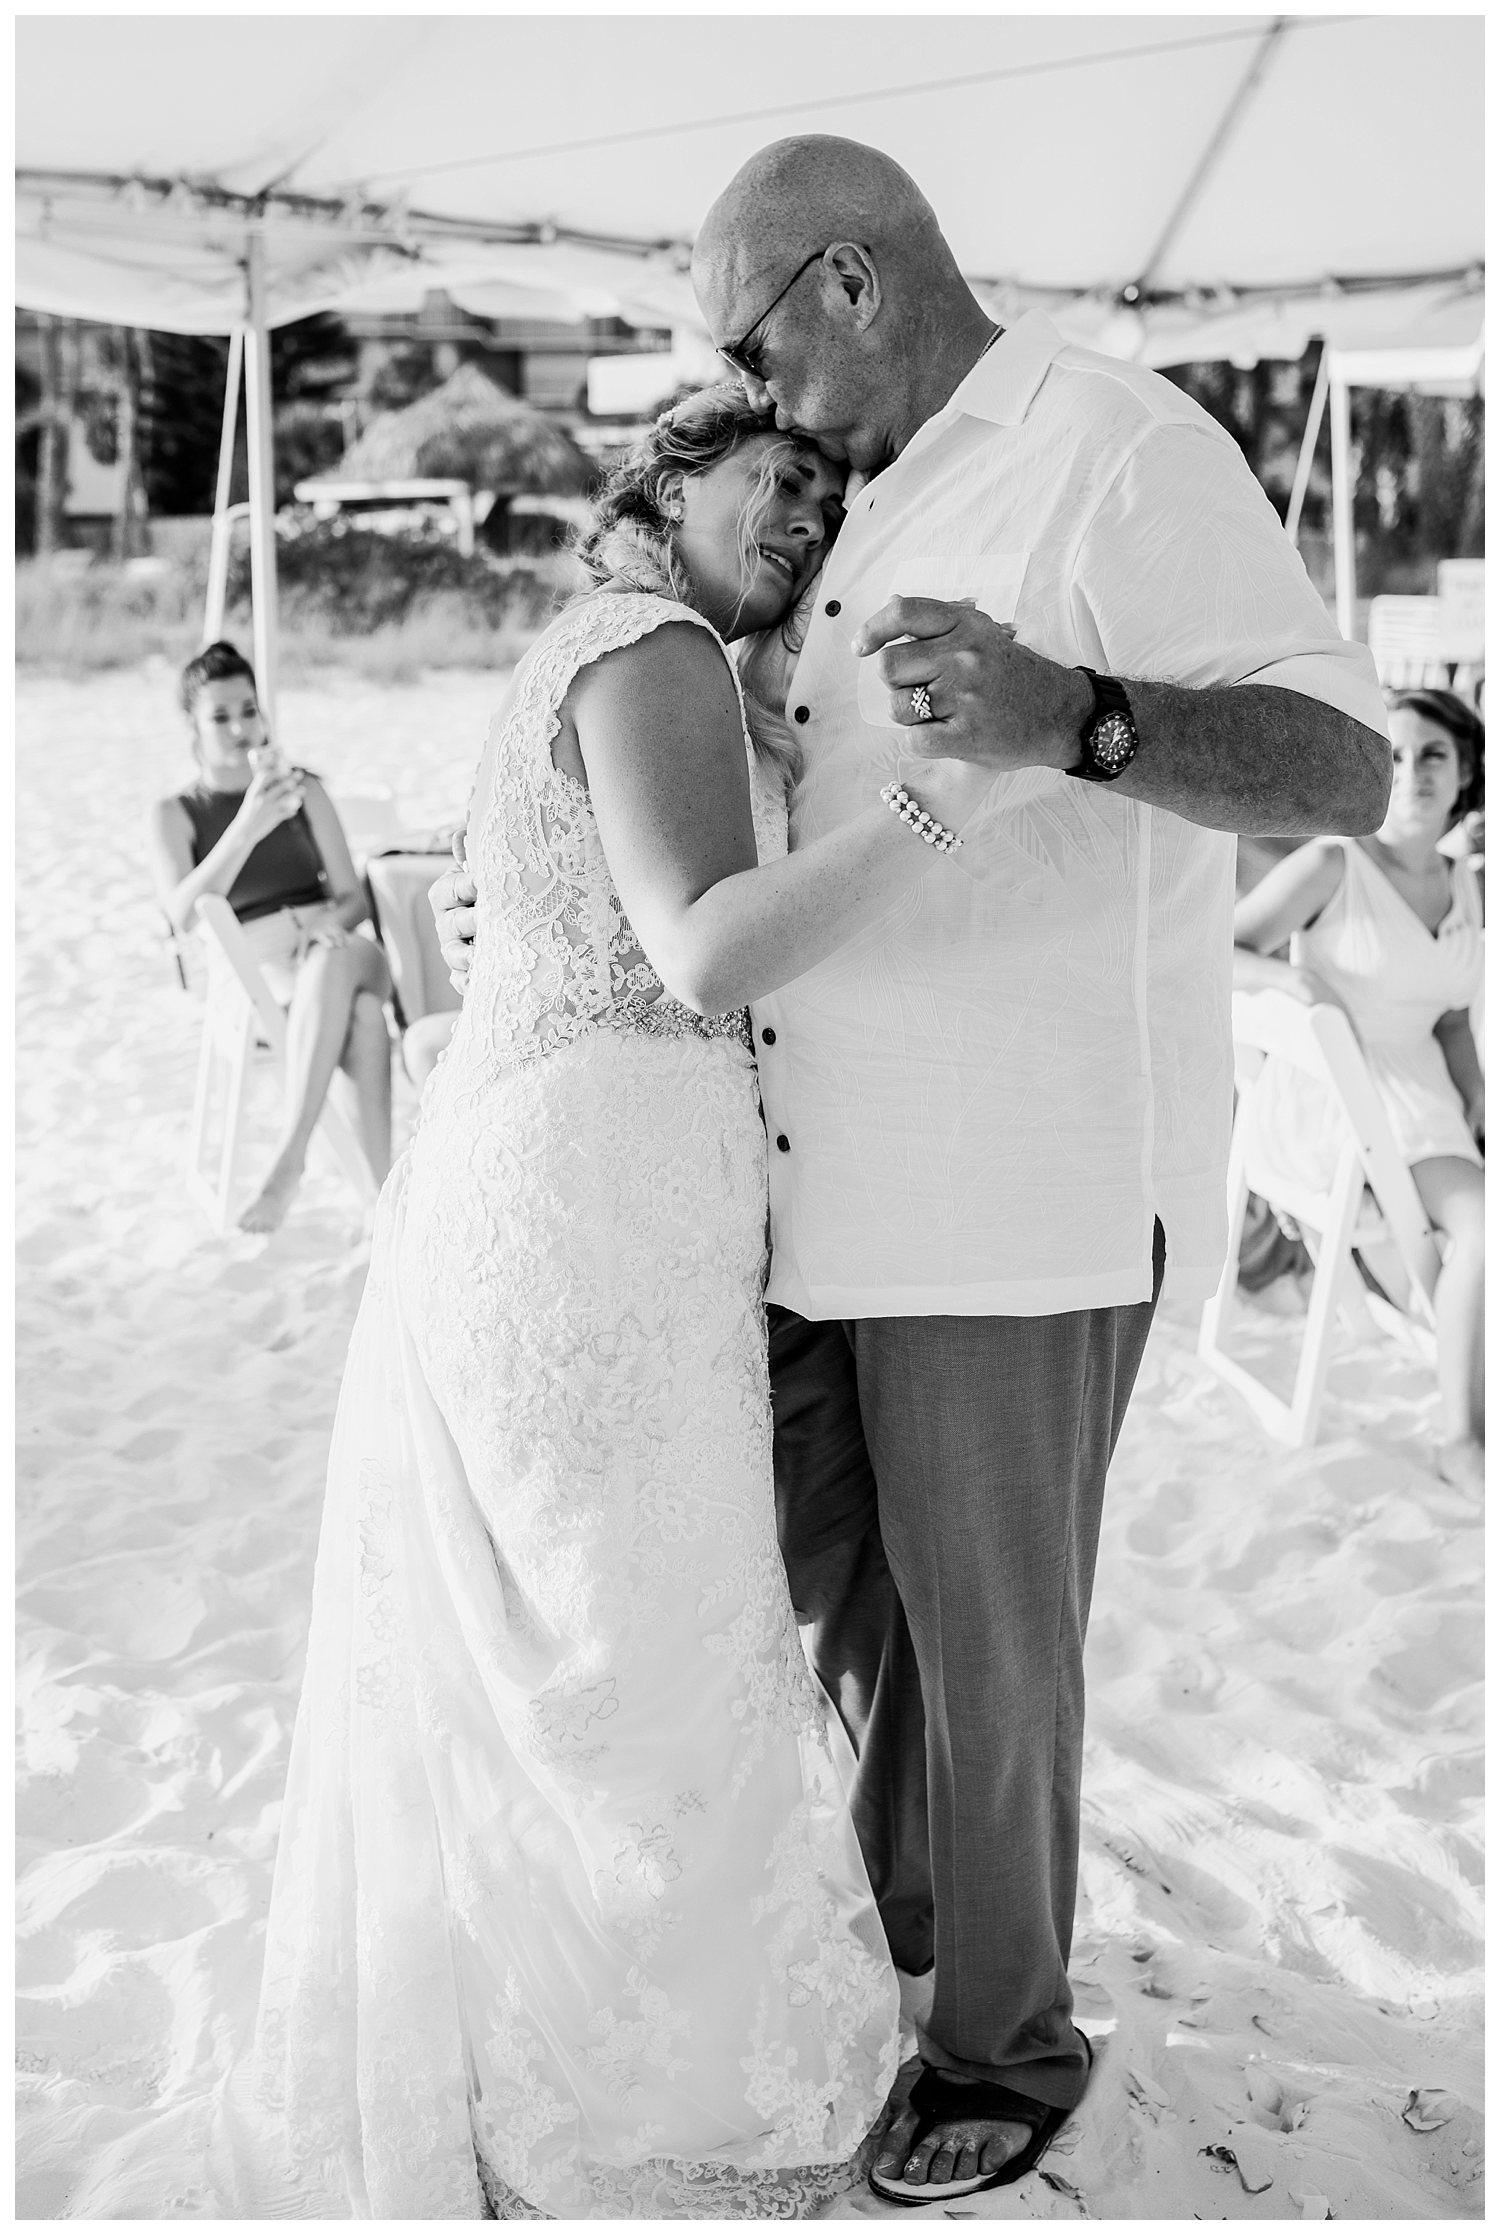 Kelsey_Diane_Photography_Destination_Wedding_Sarasota_Florida_Beach_Wedding_Alex_Austin_0669.jpg